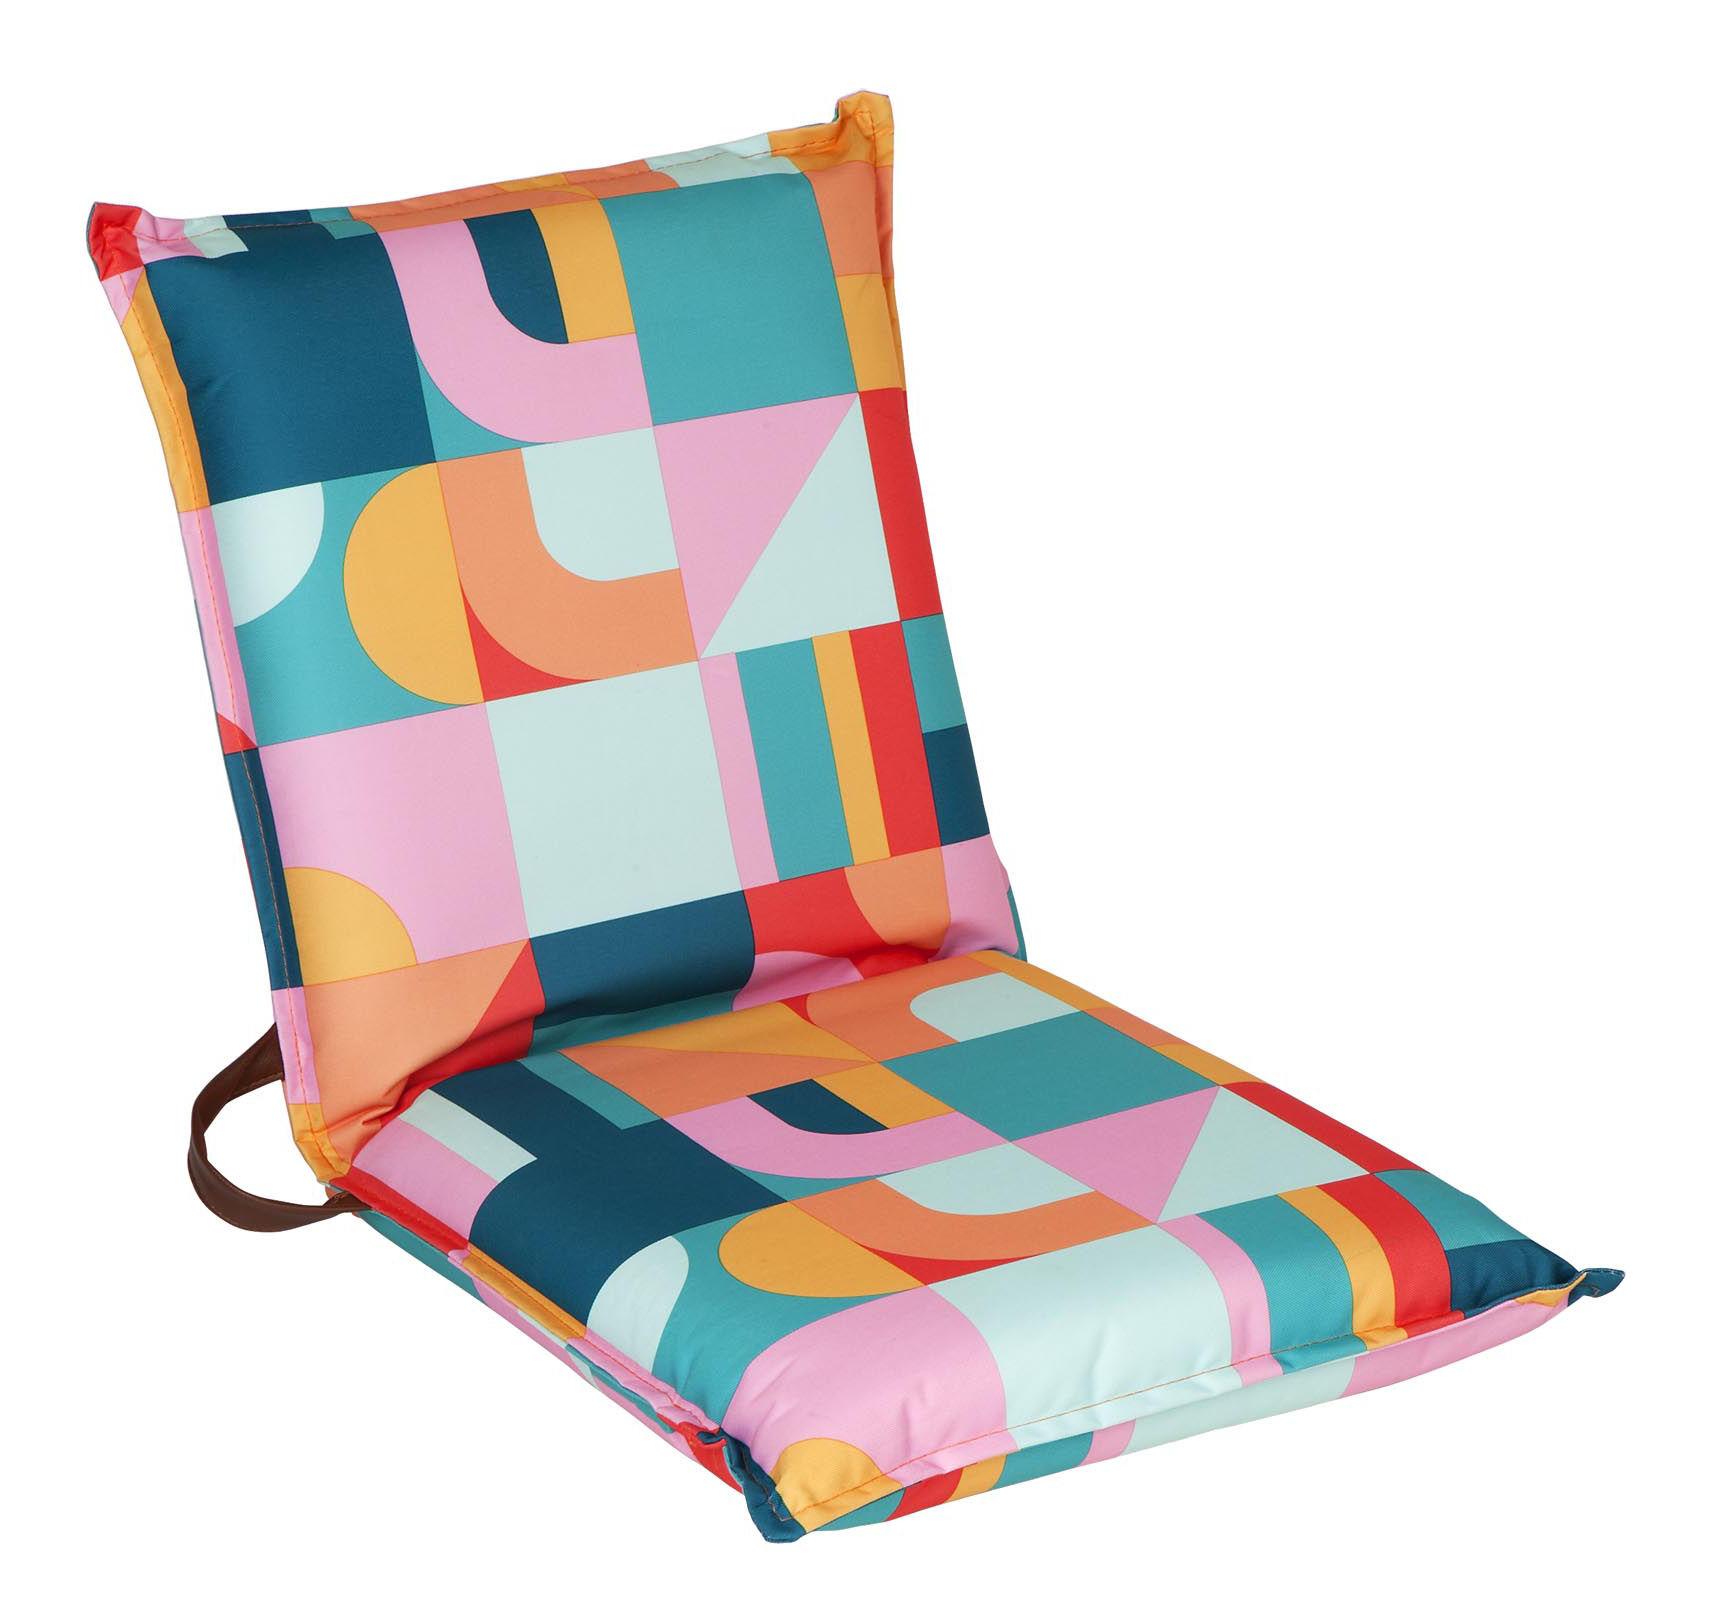 Jardin - Fauteuils - Fauteuil de plage Islabomba / Pliable - Sunnylife - Islabomba / Multicolore - Tissu